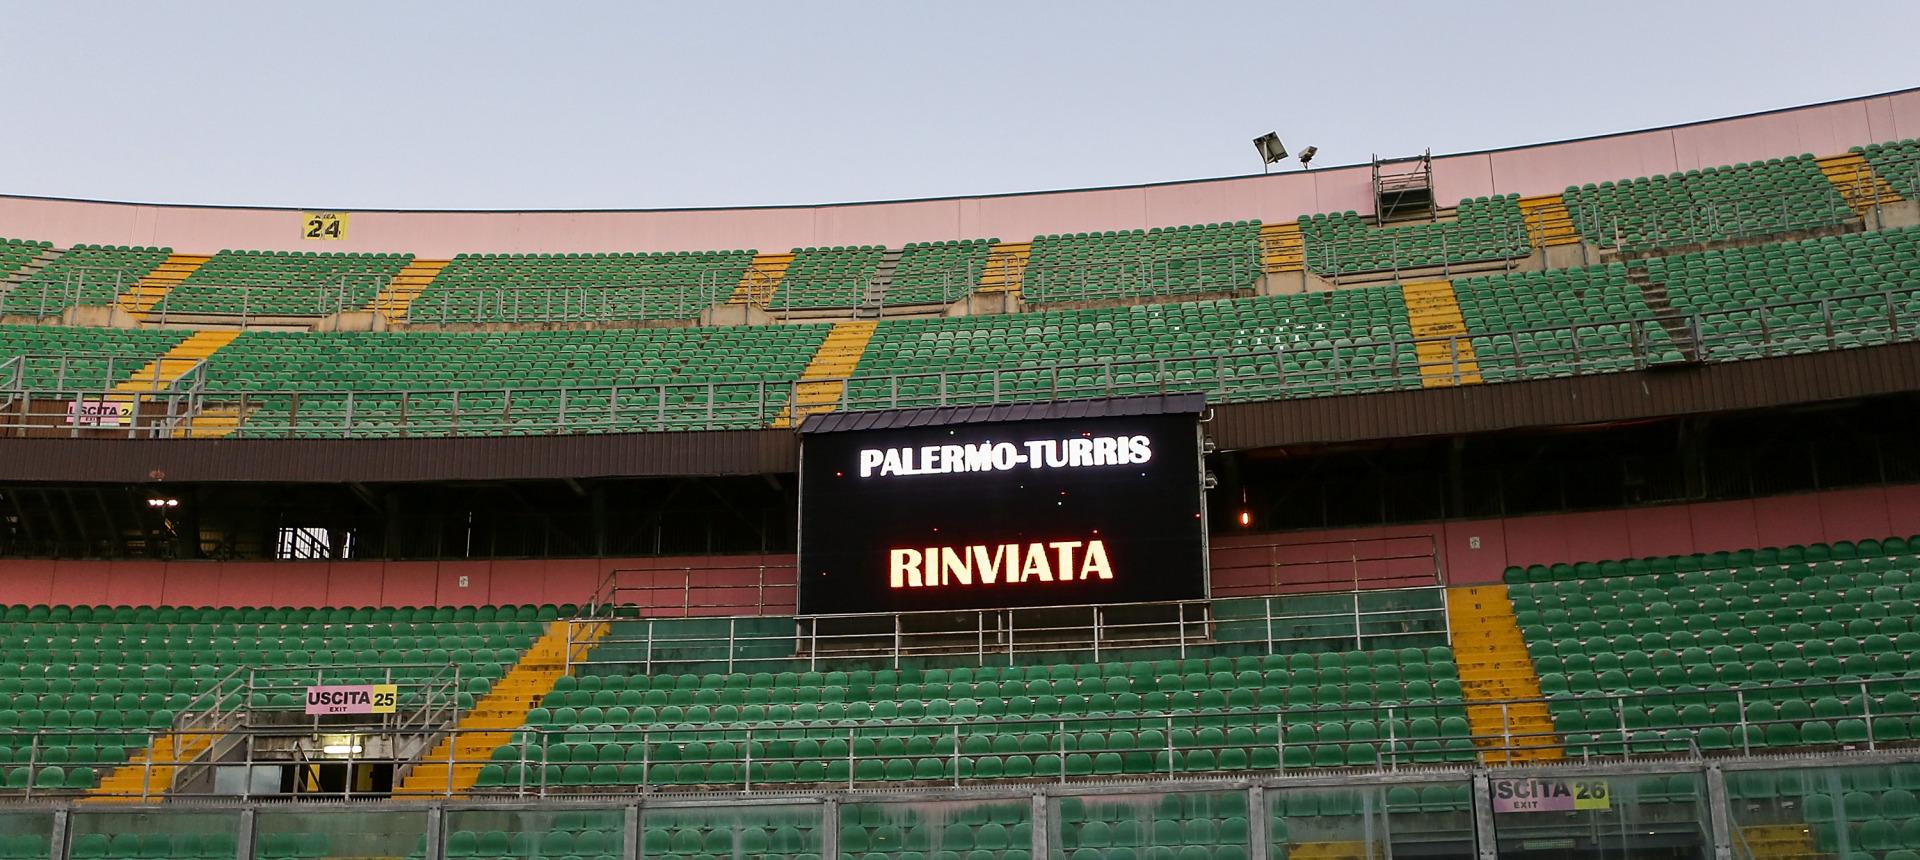 RIMBORSO BIGLIETTI PALERMO-TURRIS